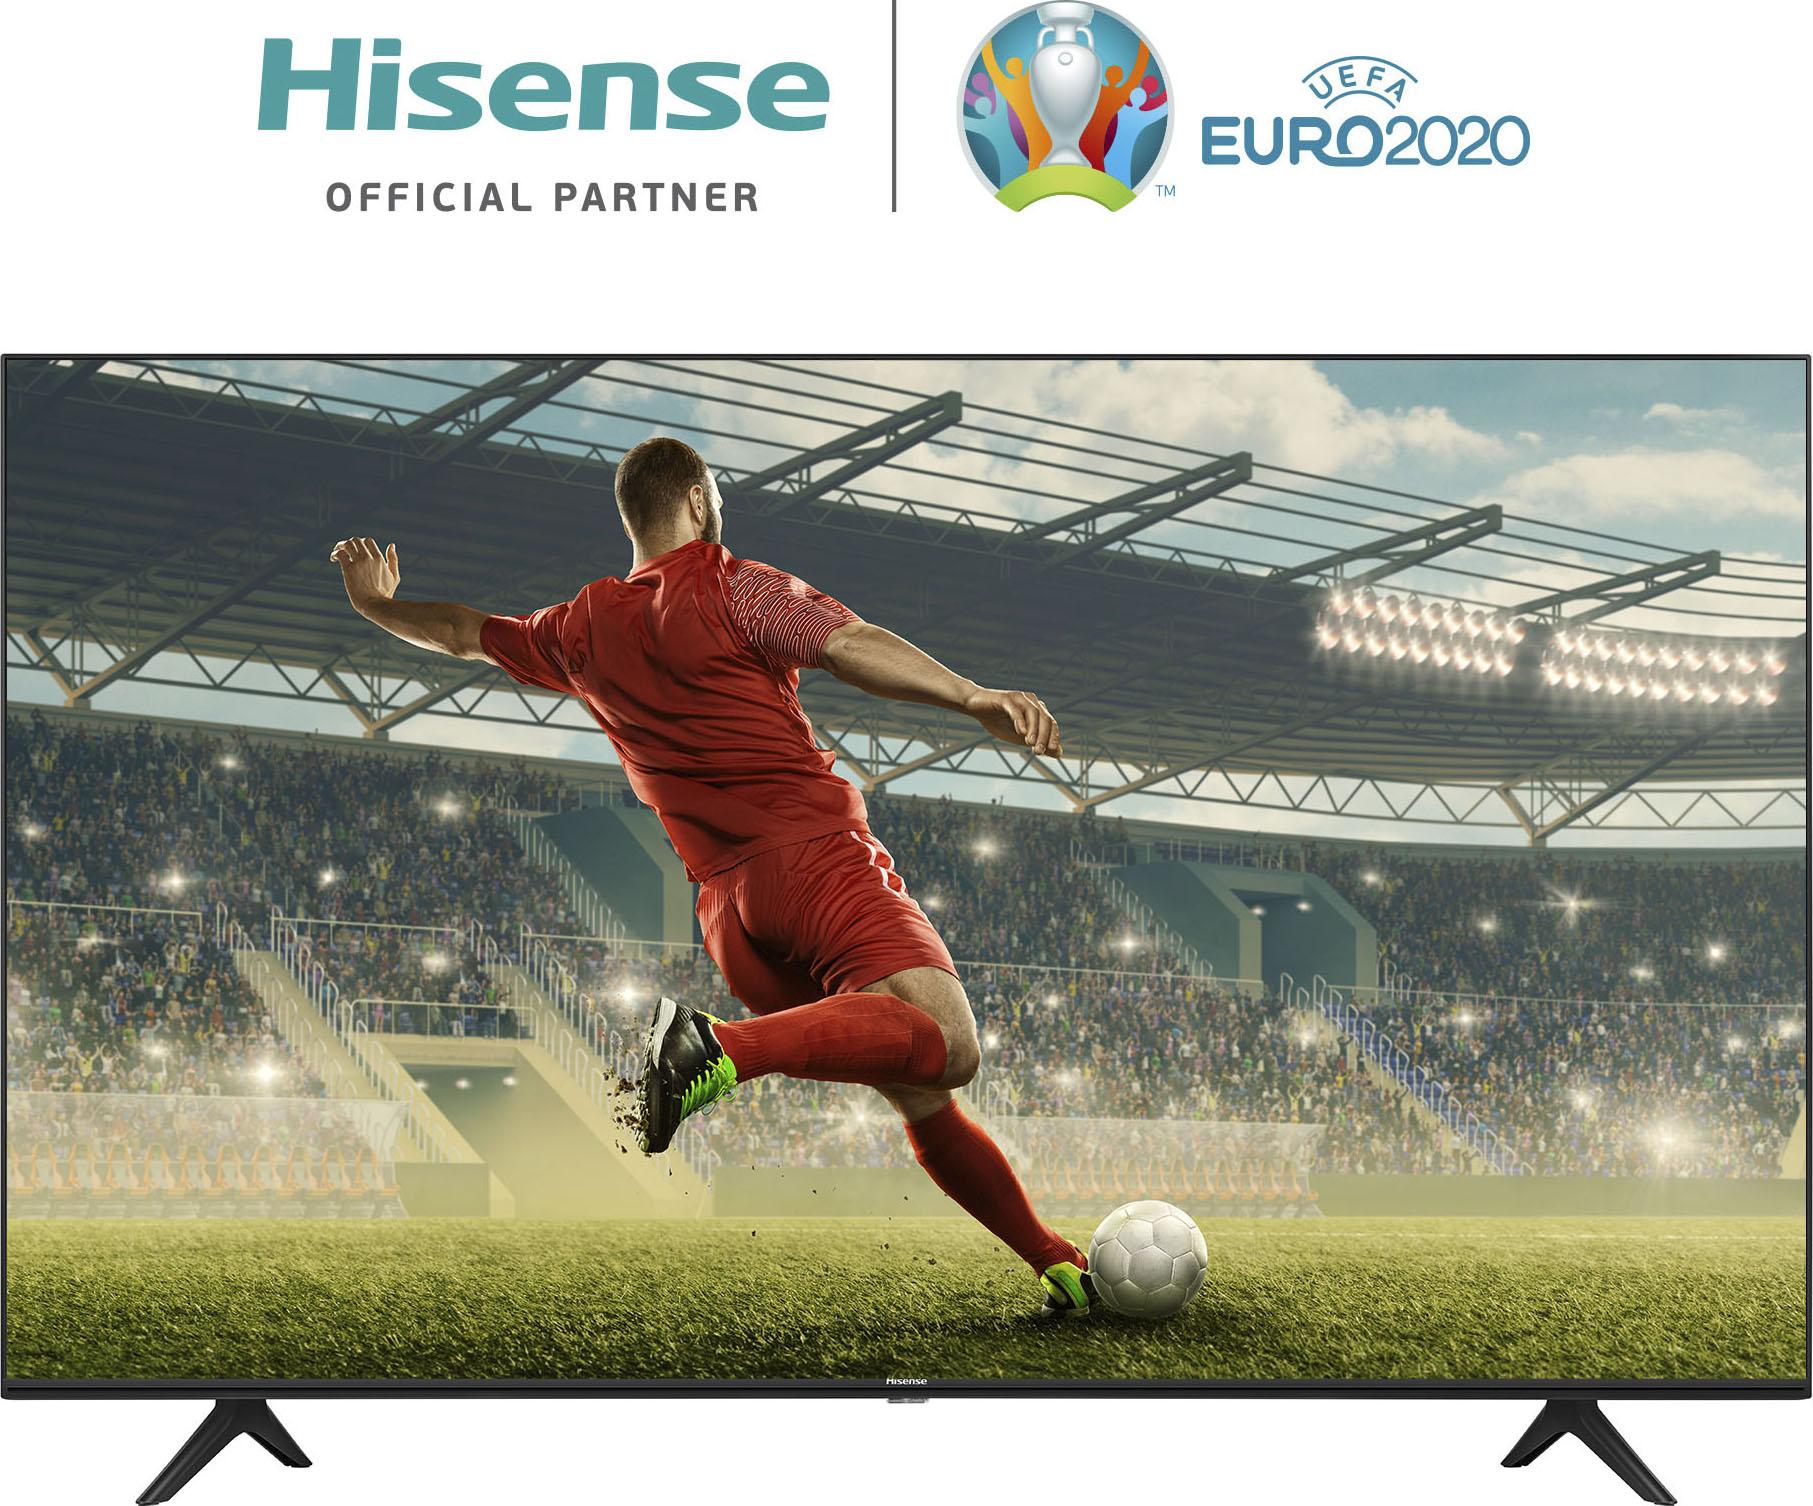 Hisense LED-Fernseher 58AE7010F , 146 cm 58 , 4K Ultra HD, Smart-TV